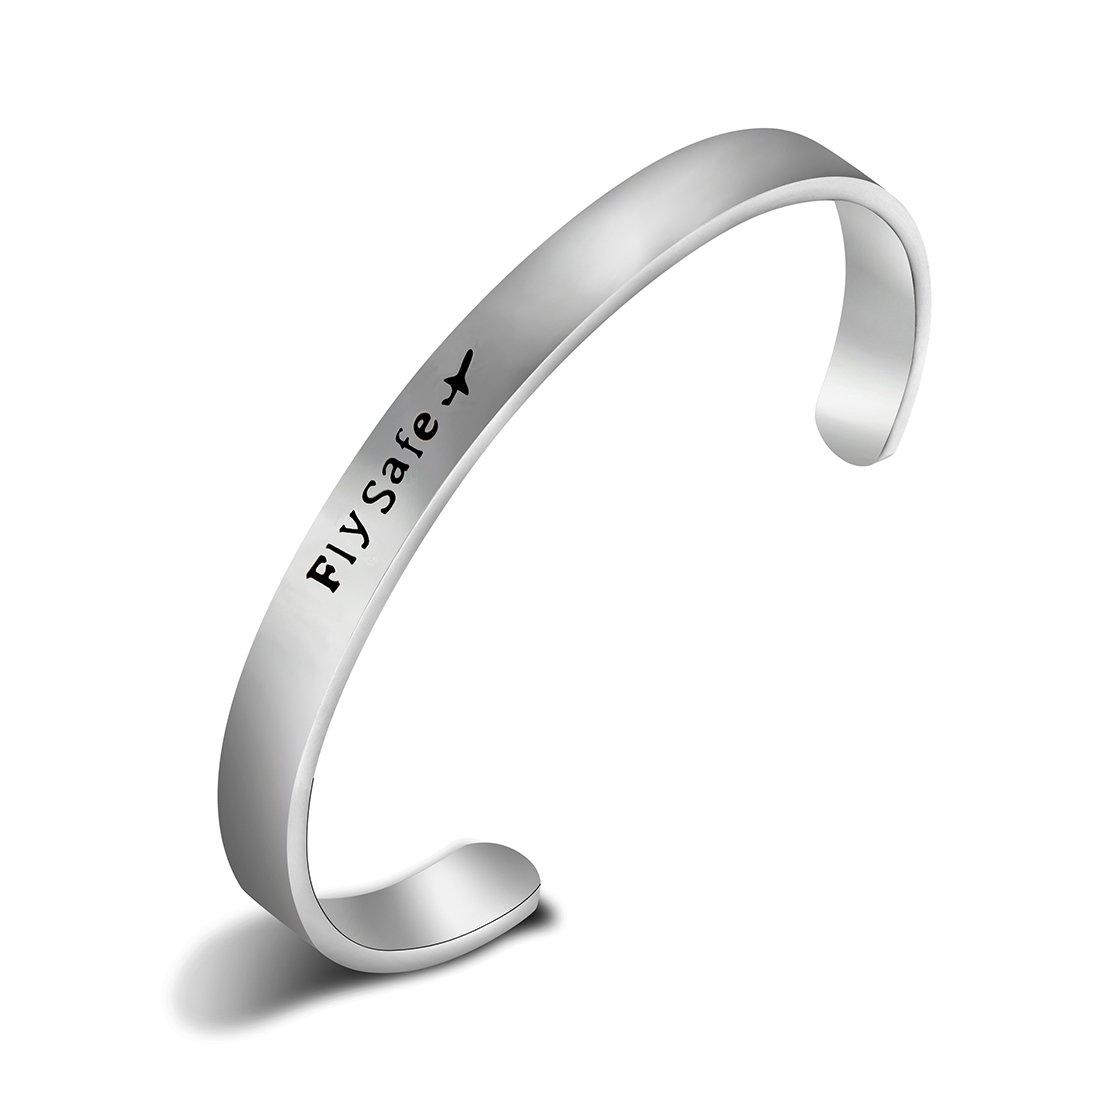 REEBOOO Flight Attendant Gift,Fly Safe Bracelet,Airplane Jewelry,Travel Jewelry (Silver Bracelet)